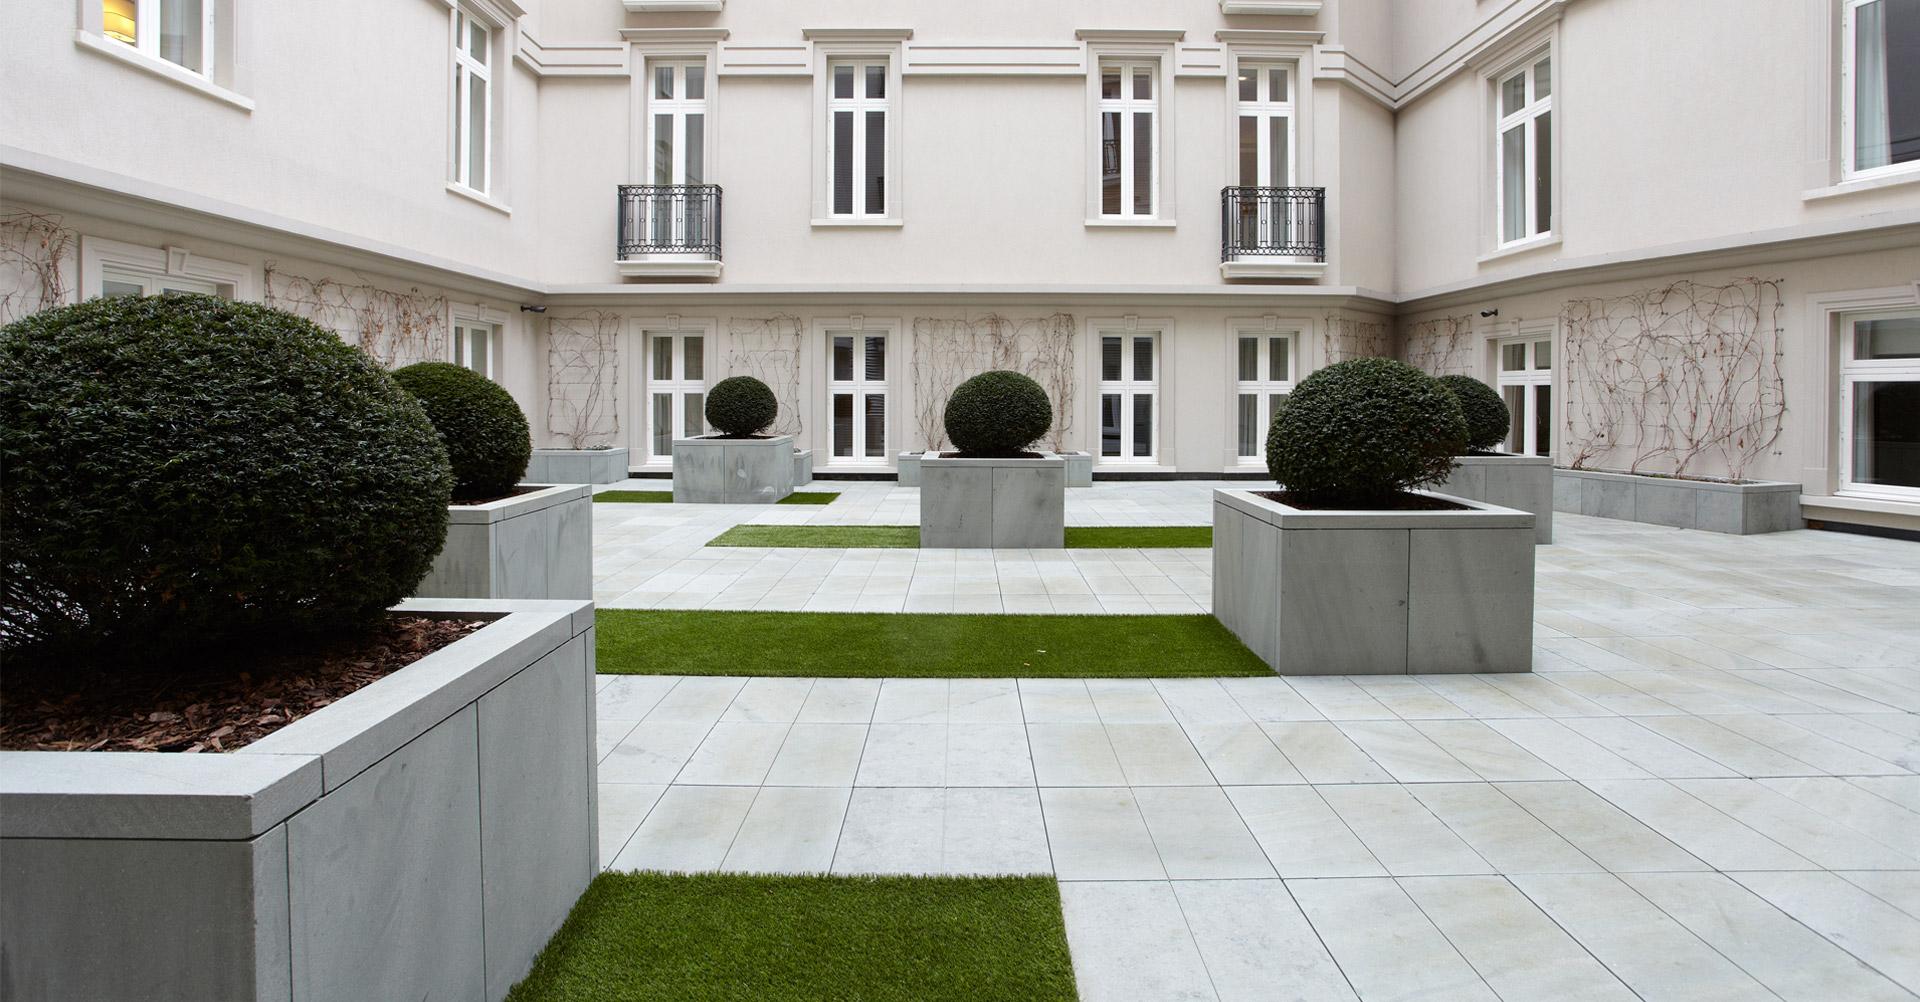 corinthia-hotel-london-11